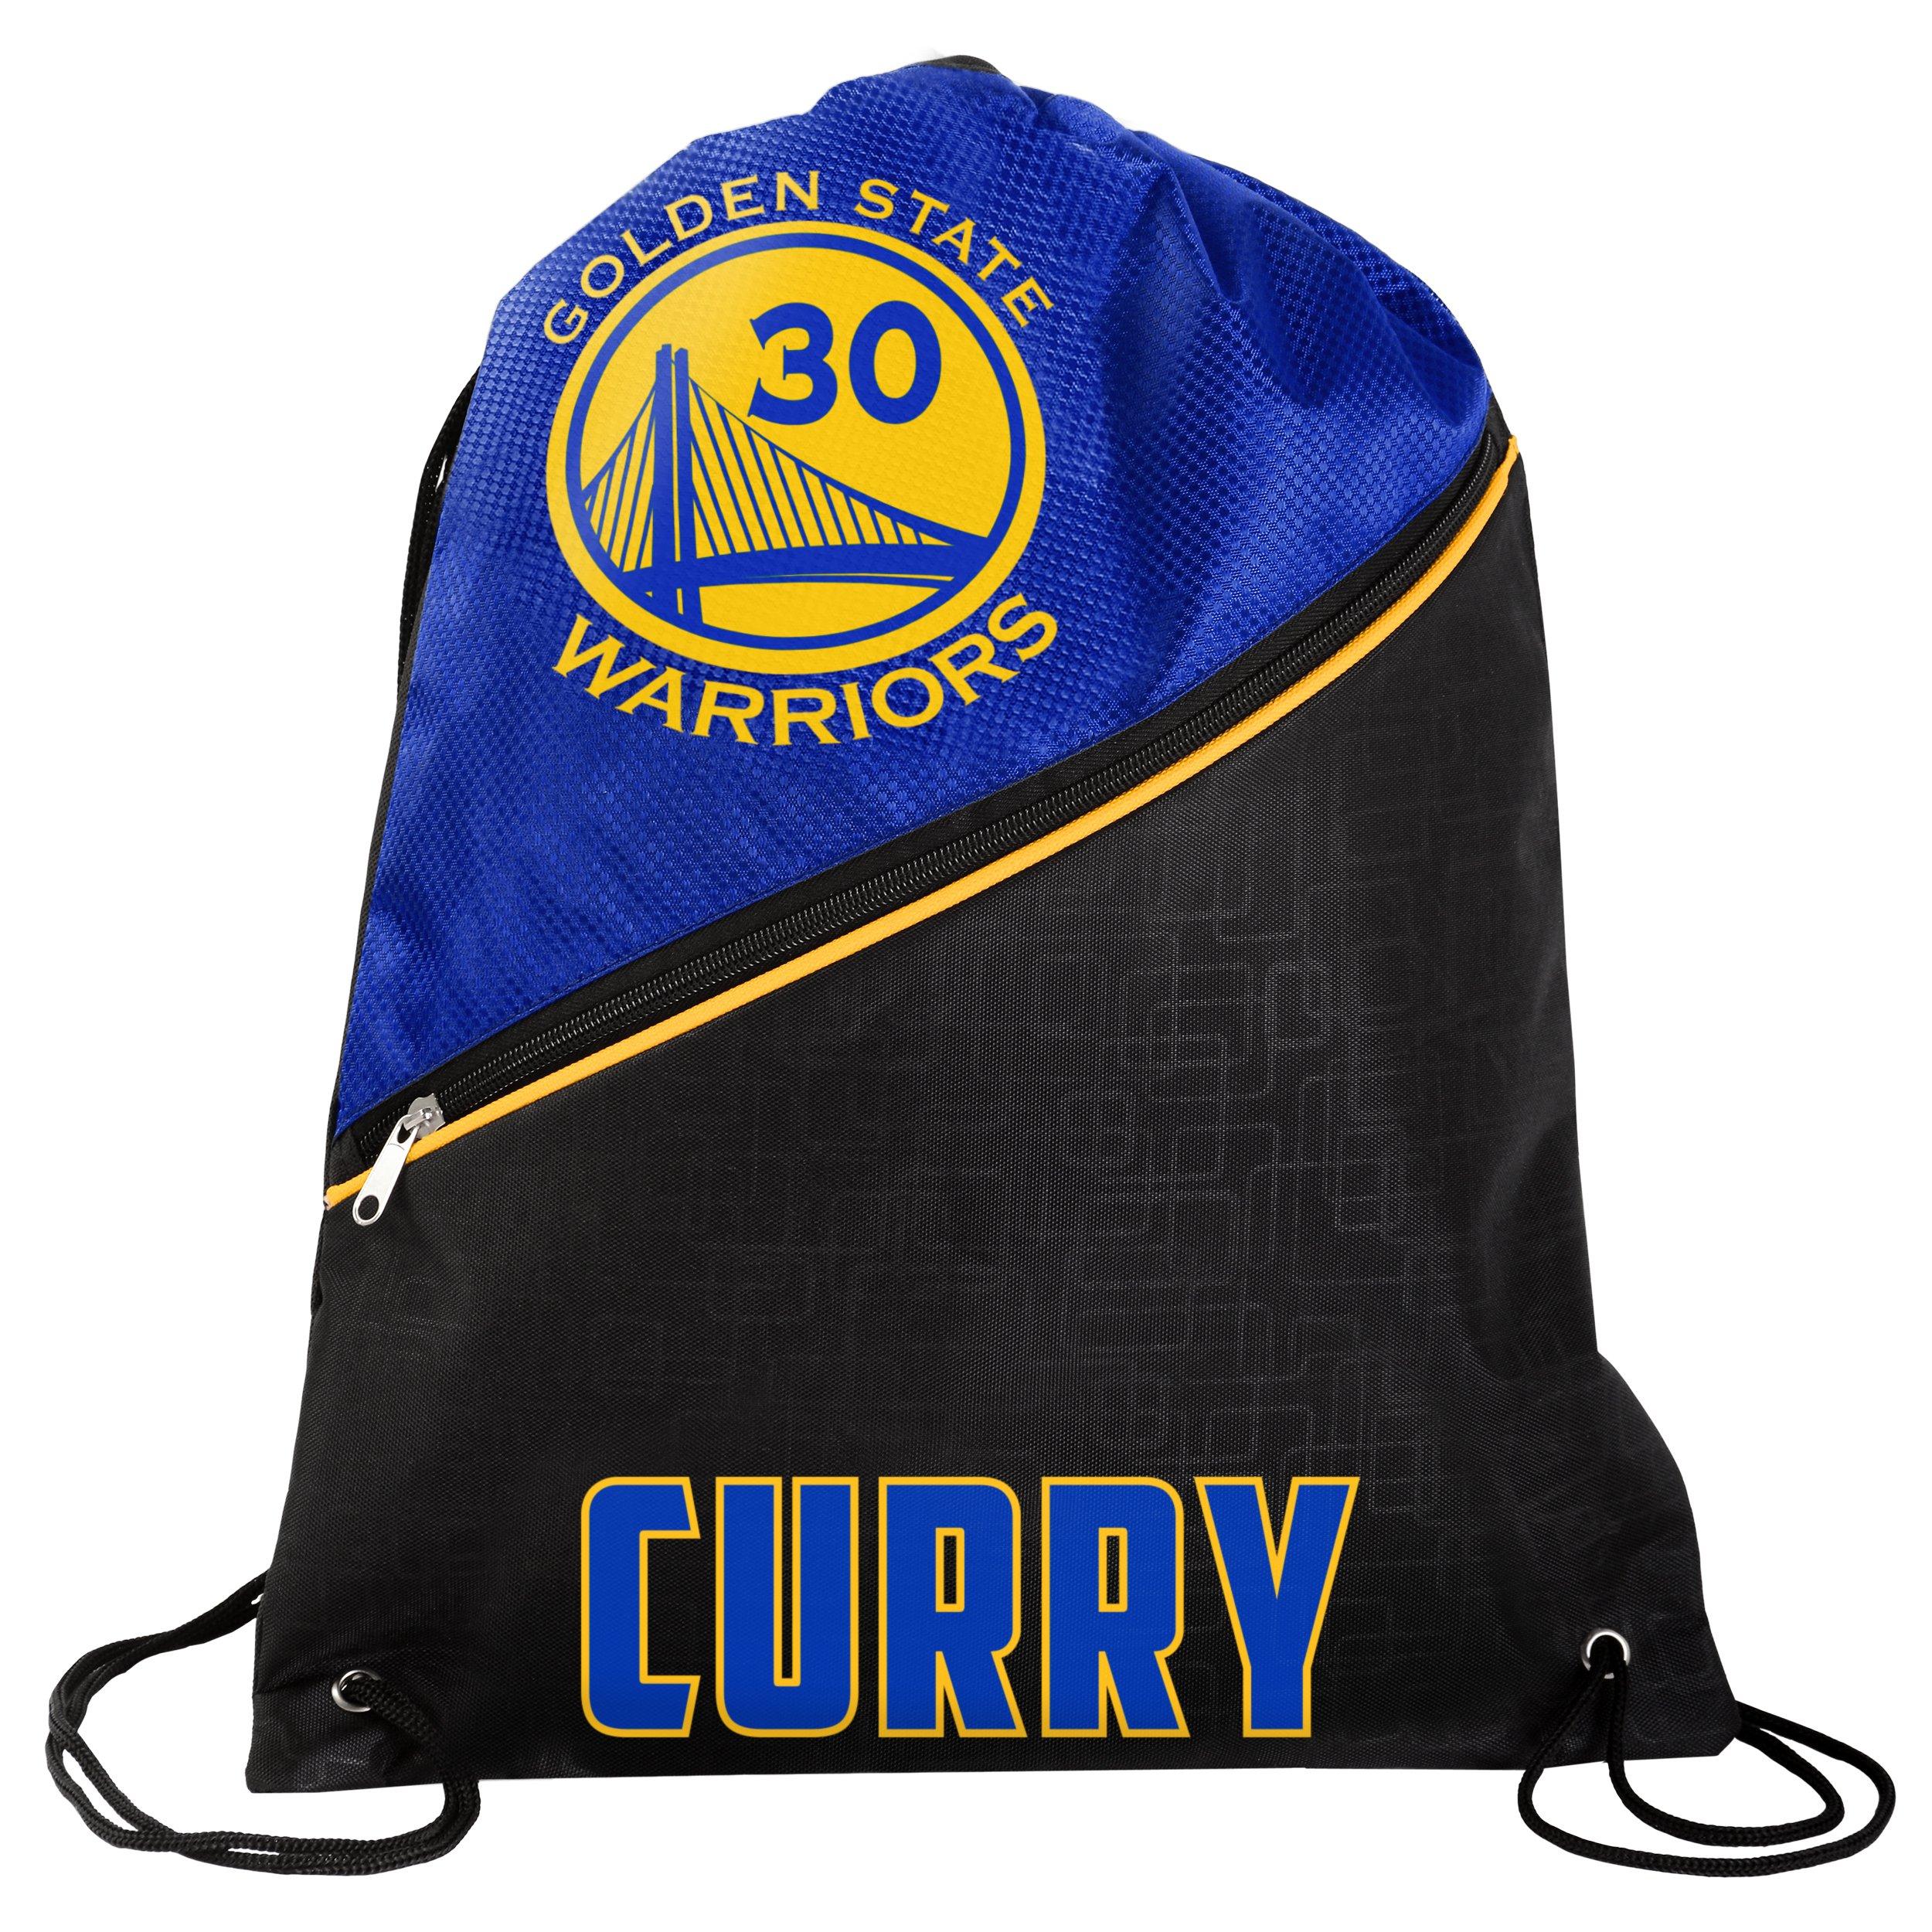 Golden State Warriors Official NBA High End Diagonal Zipper Drawstring Backpack Gym Bag - Stephen Curry #30